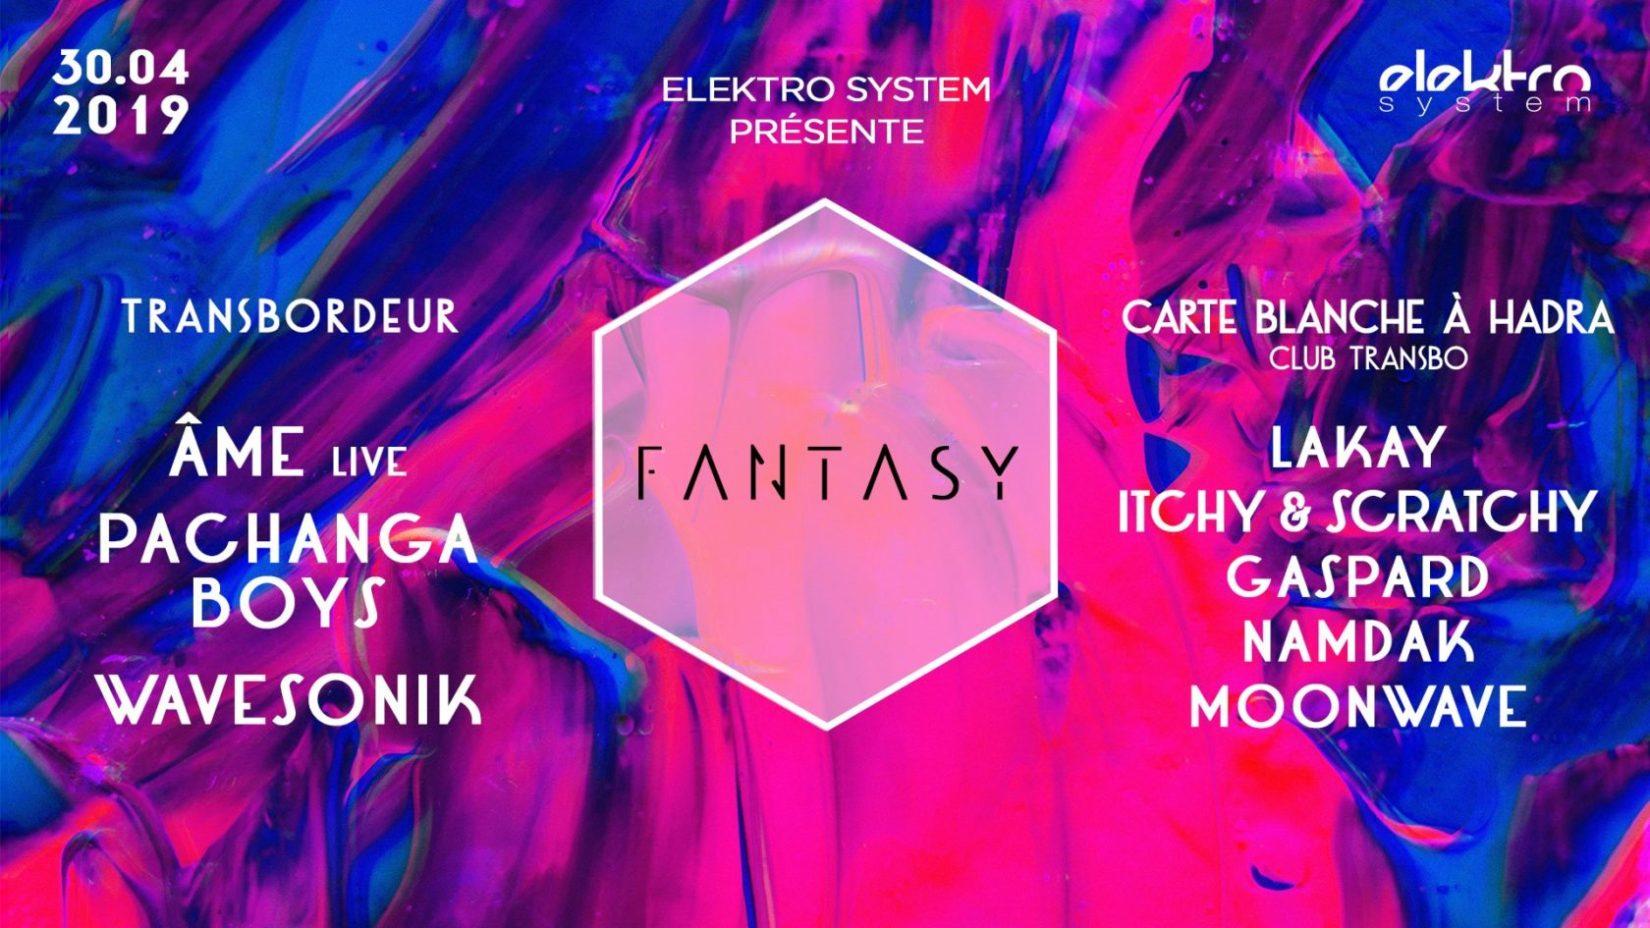 Fantasy : Âme live, Pachanga Boys, Gaspard, Hadra team